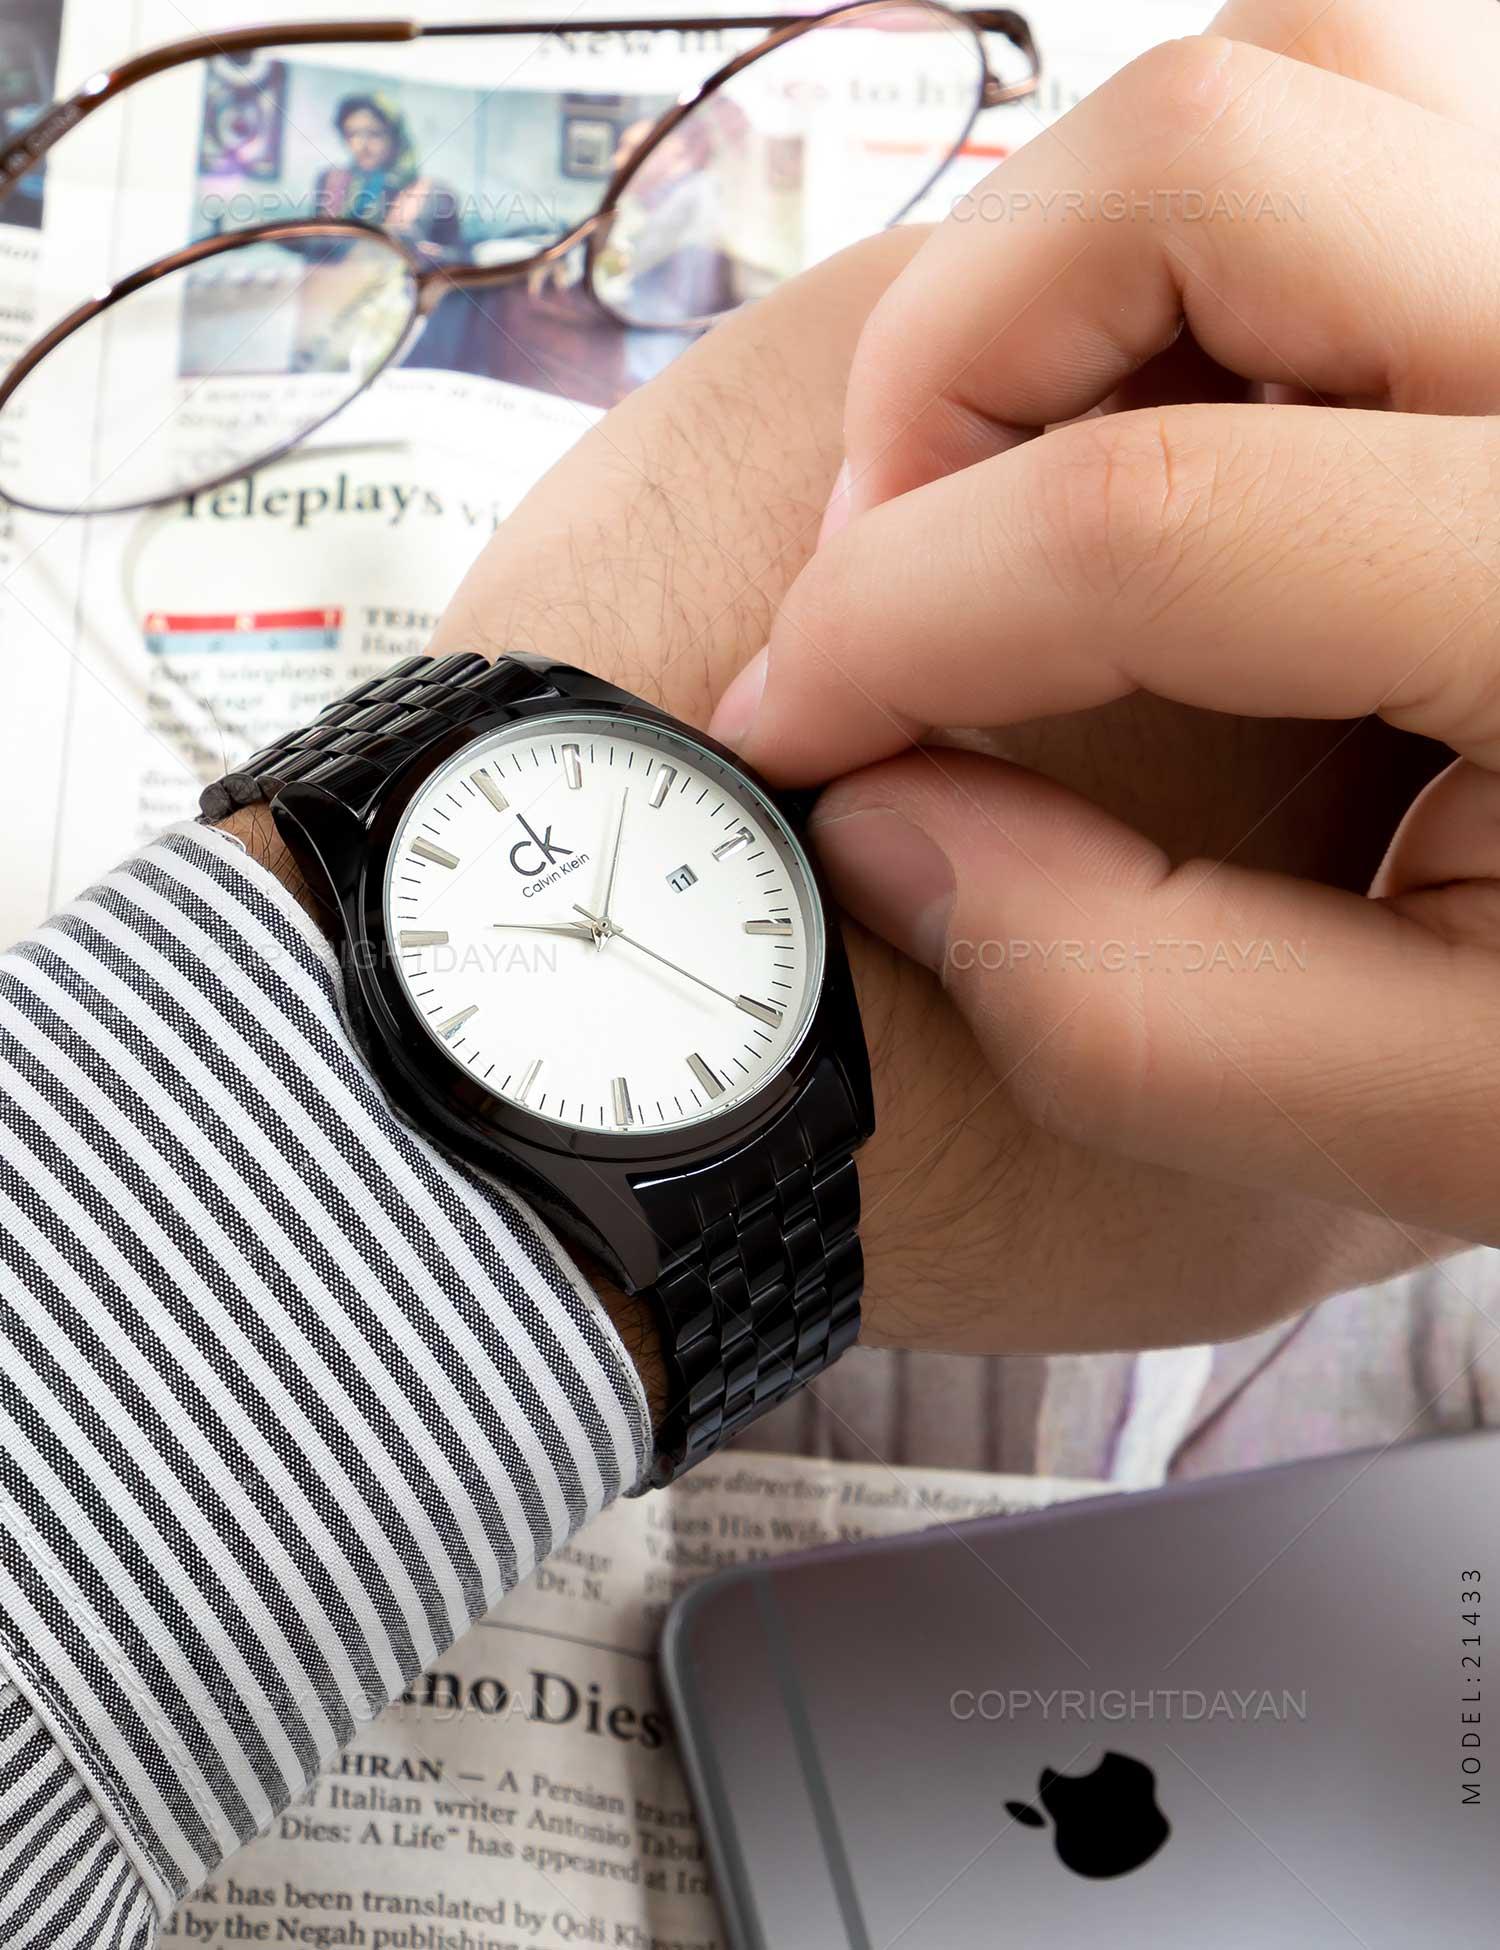 ساعت مچی مردانه Calvin Klein مدل 21433 ساعت مچی مردانه Calvin Klein مدل 21433 169,000 تومان